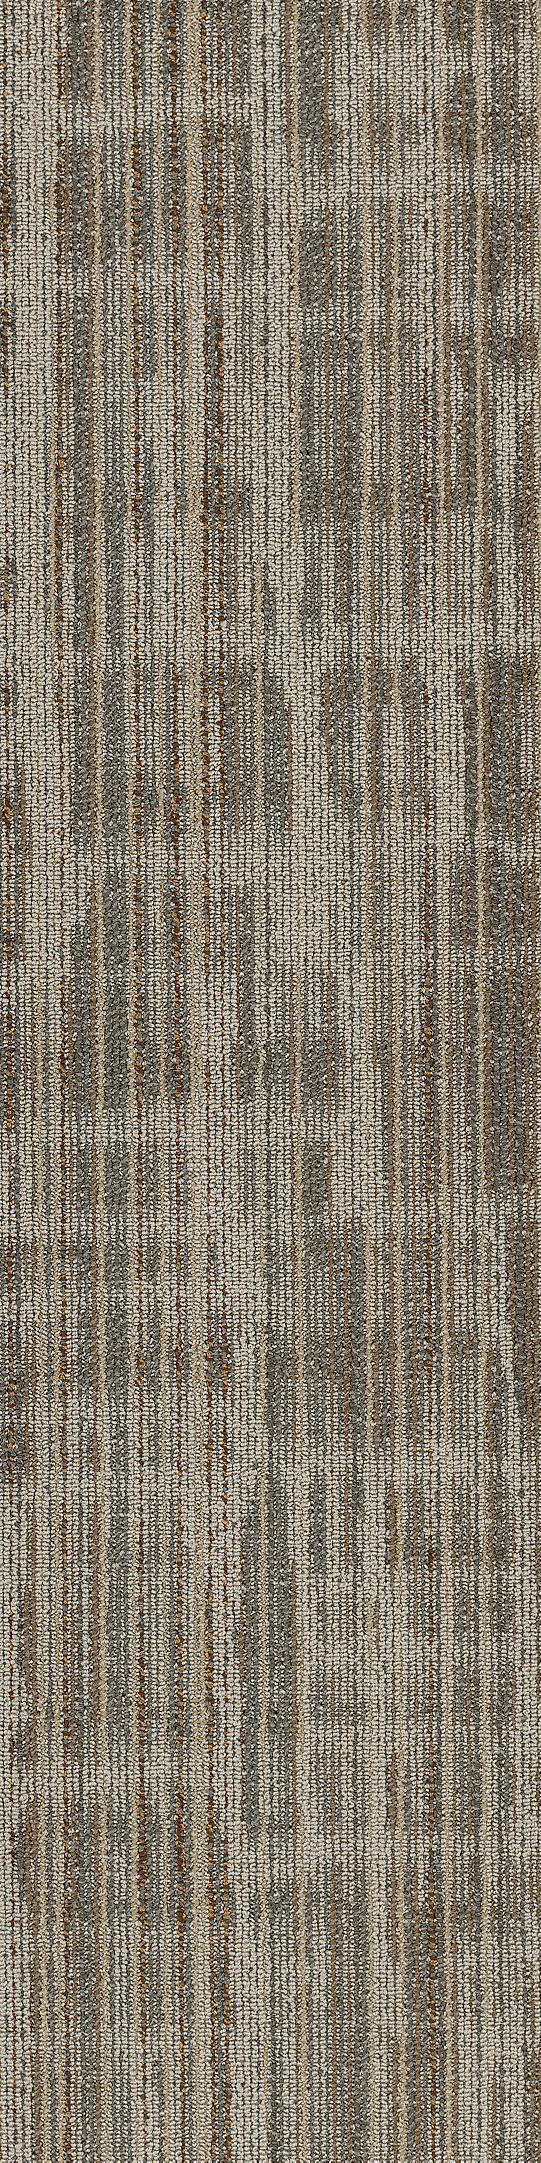 48 sq ft//ctn 1 Box Shaw Alloy Shimmer Carpet Tile Nickel Bronze 12 x 48 Builder